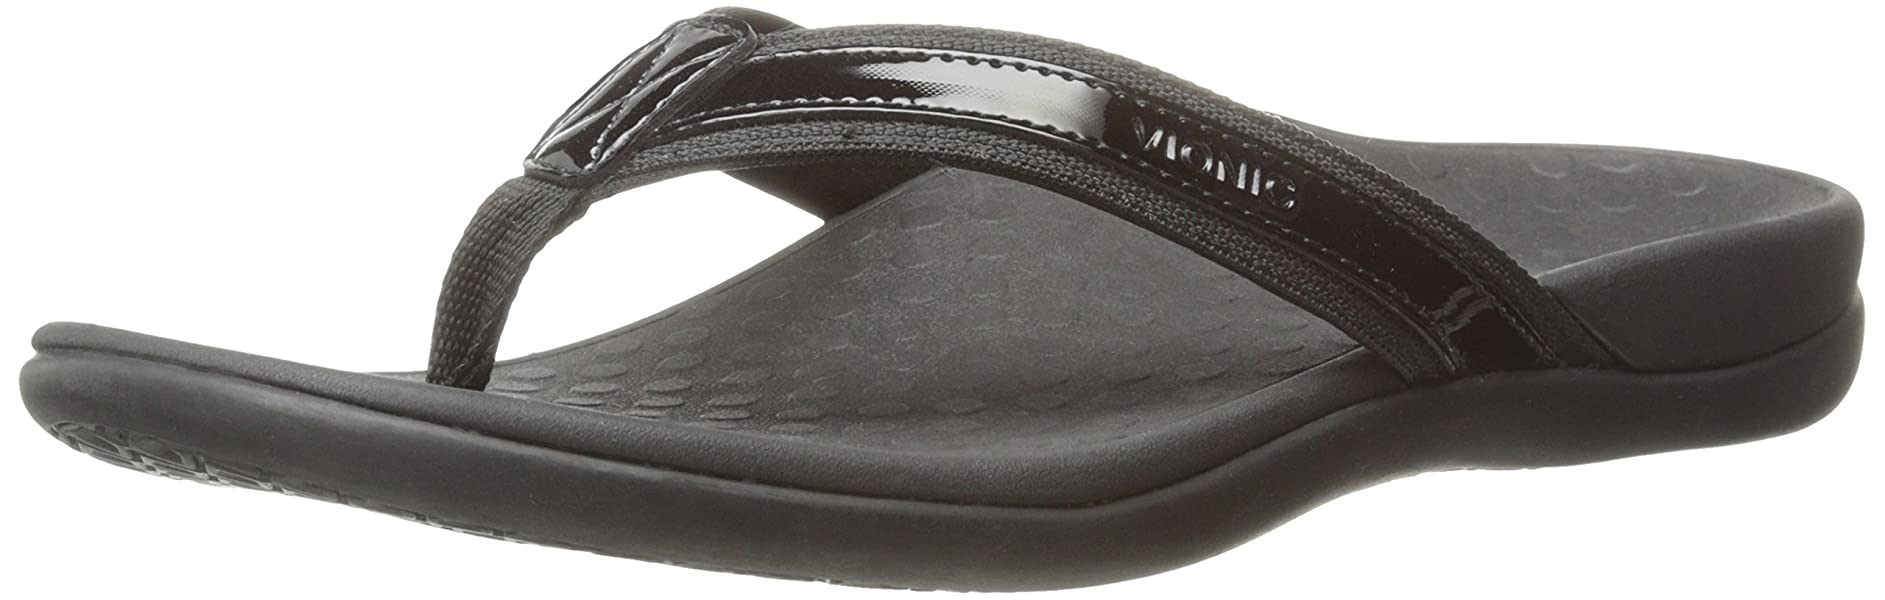 Orthaheel Vionic By Orthaheel Tideii Women Slide In Orthopedic Sandals (5 B(M) Us, Black)